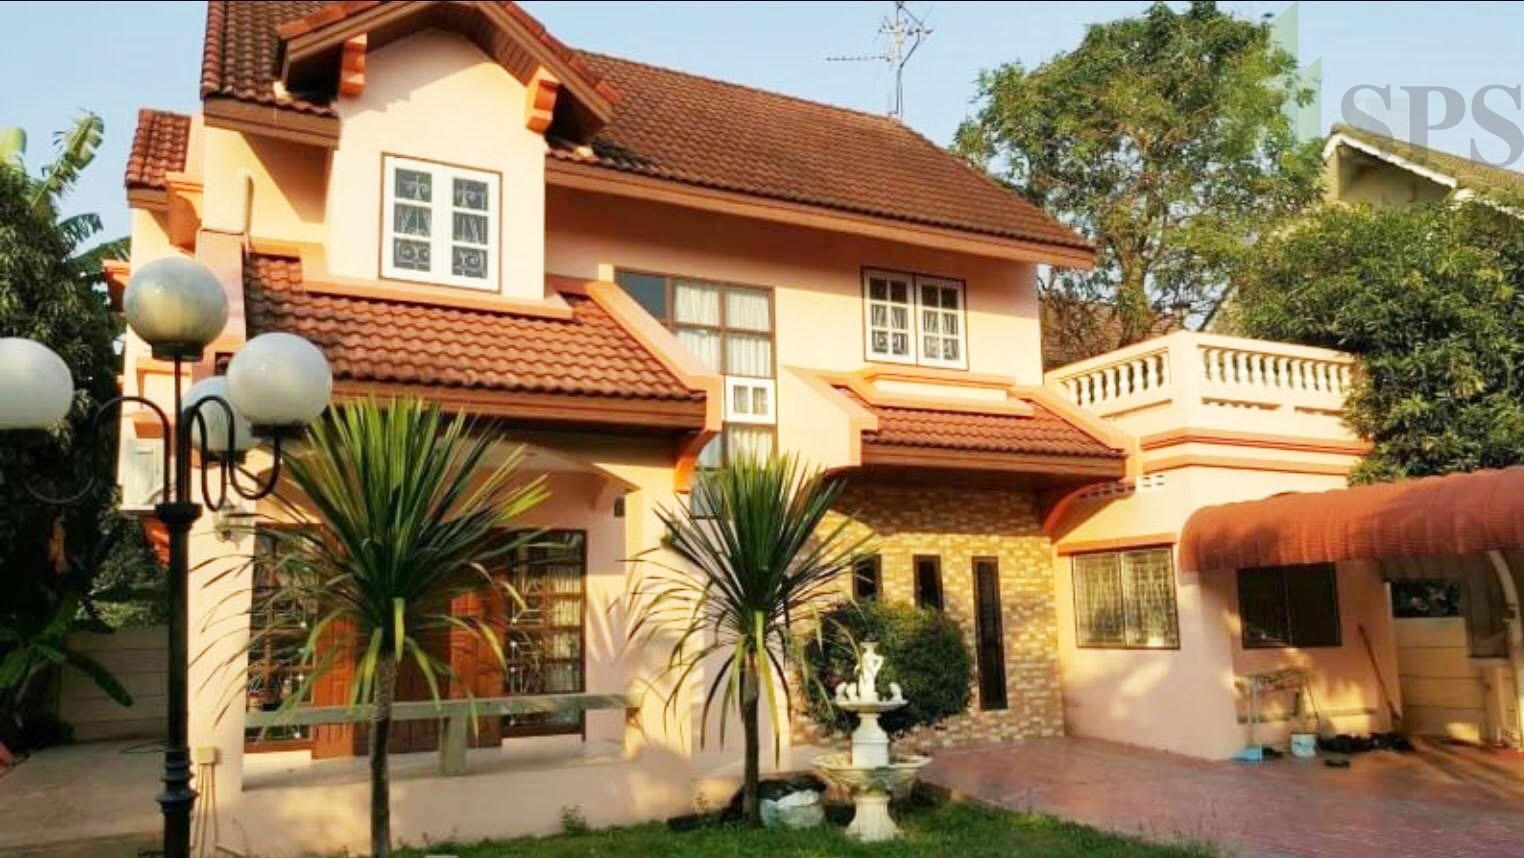 For Rent Single house Ekpailin 4 beds Sri Dan6 (SPS-GH142)